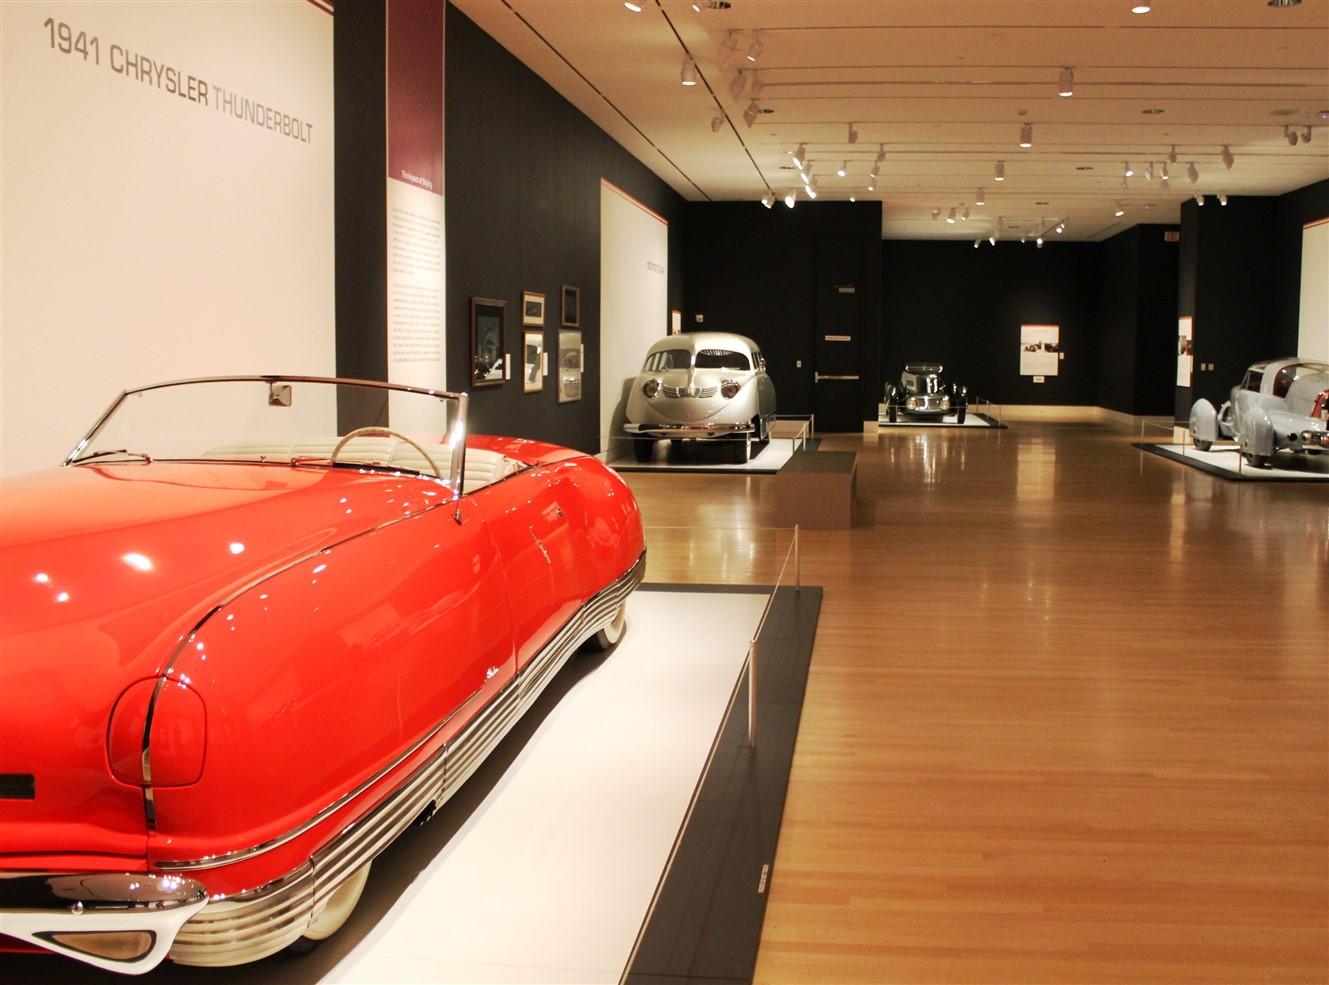 2015 07 18 291 Indianapolis Museum of Art.jpg